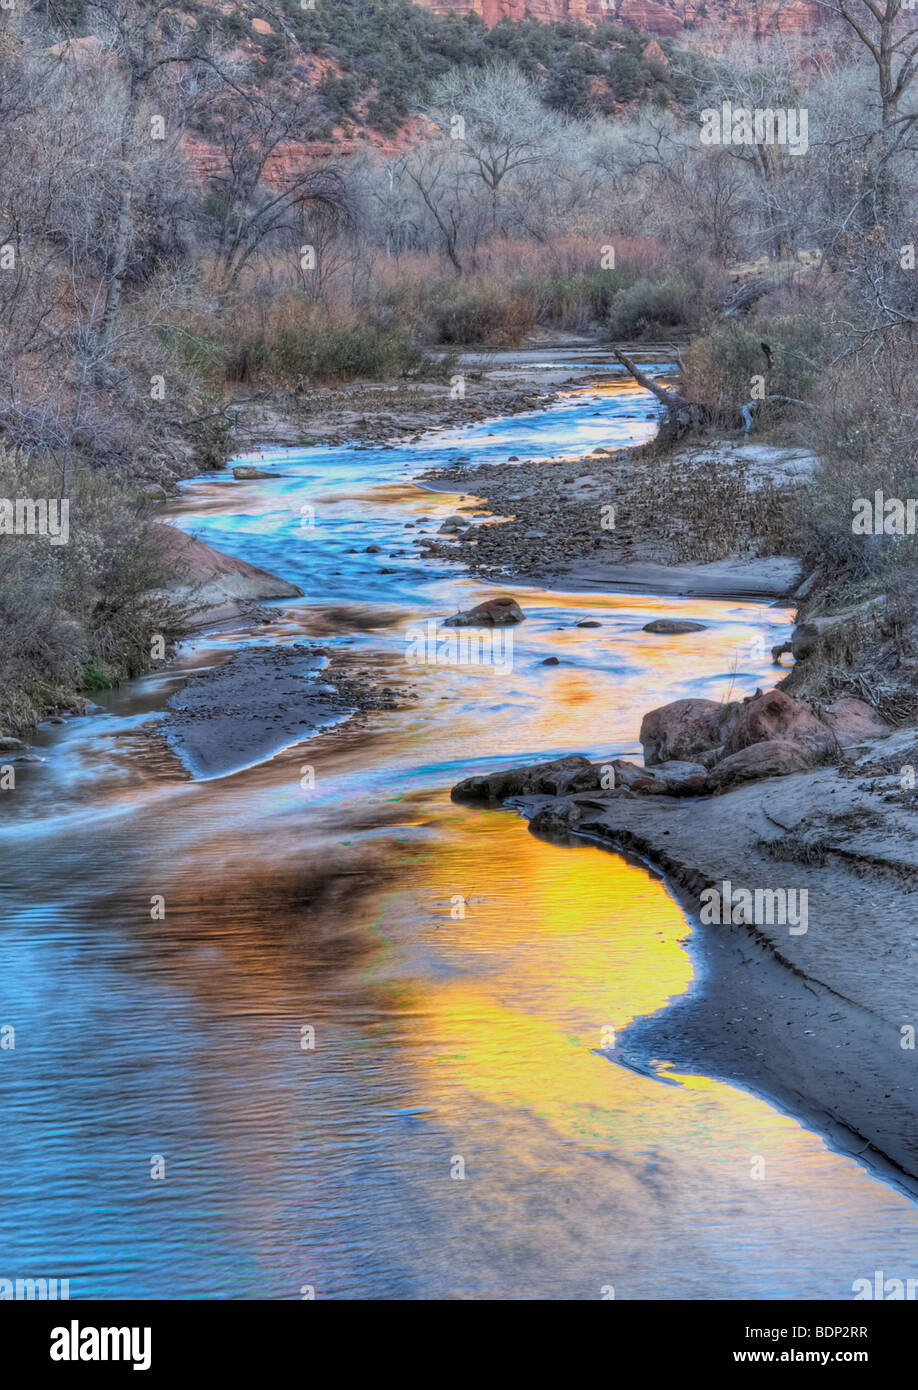 Virgin River in Zion National Park Utah - Stock Image